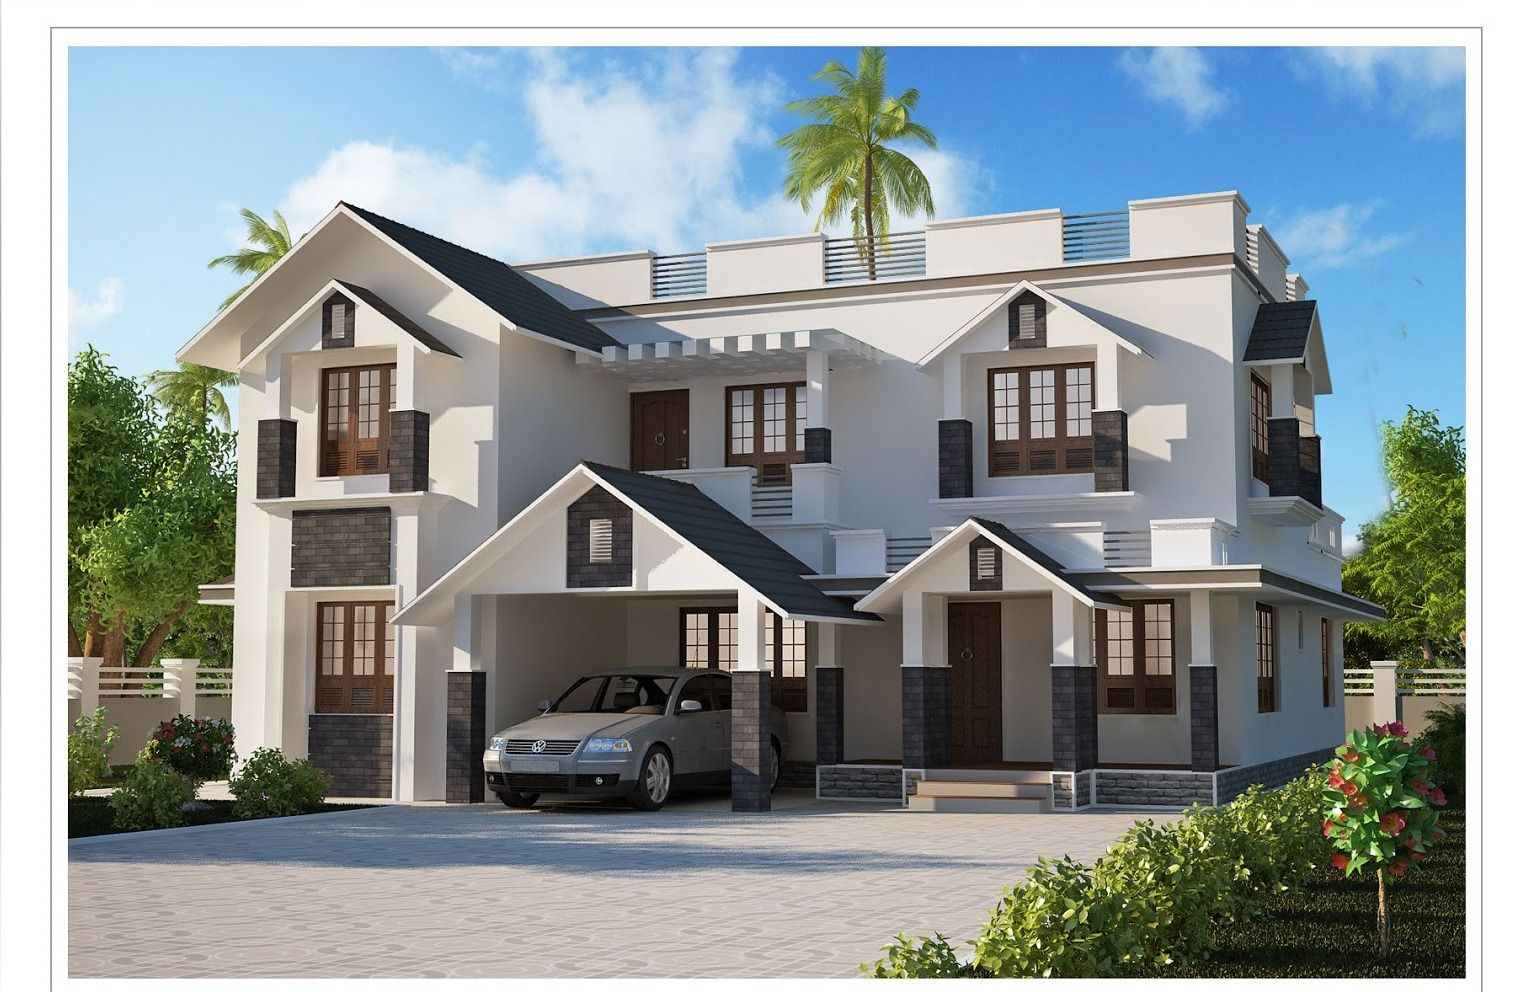 Modern Kerala House Design 2013 At 2980 Sq Ft Kerala House Design House Design Photos Kerala Houses